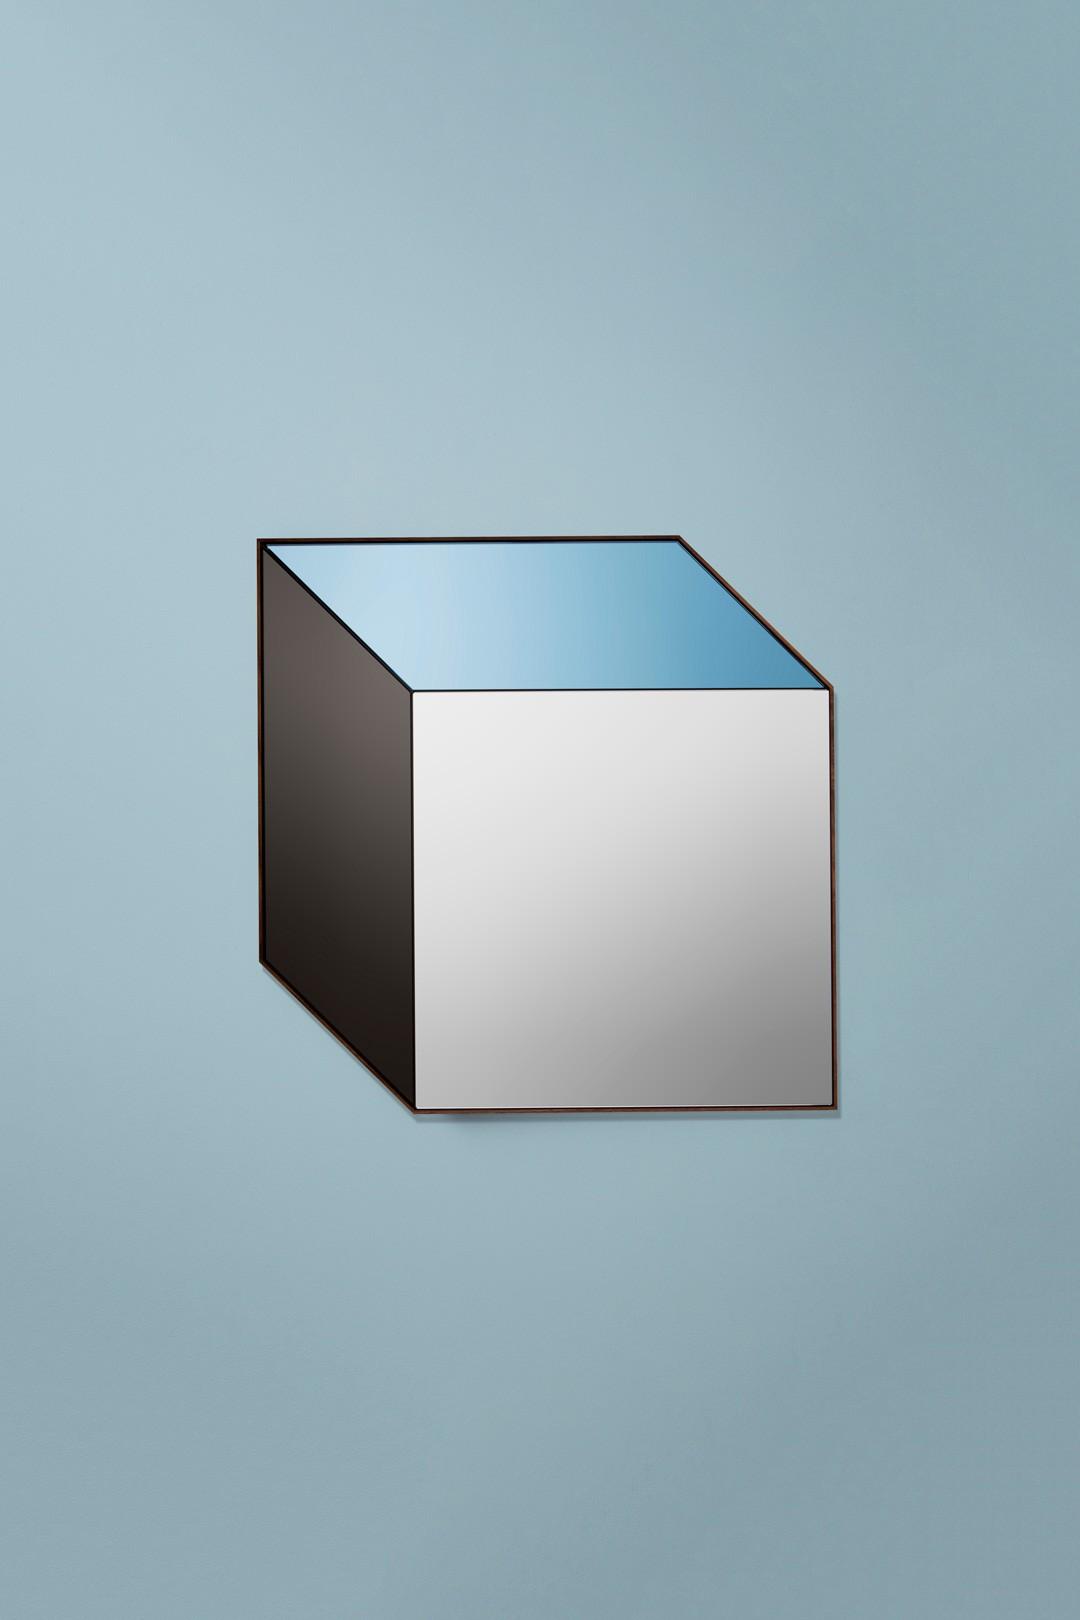 Pyramid Mirror 1 450 Bower Studios Mirrors Cube Blue Black Clear Modern Luxury Contemporary Designer Custom Wall